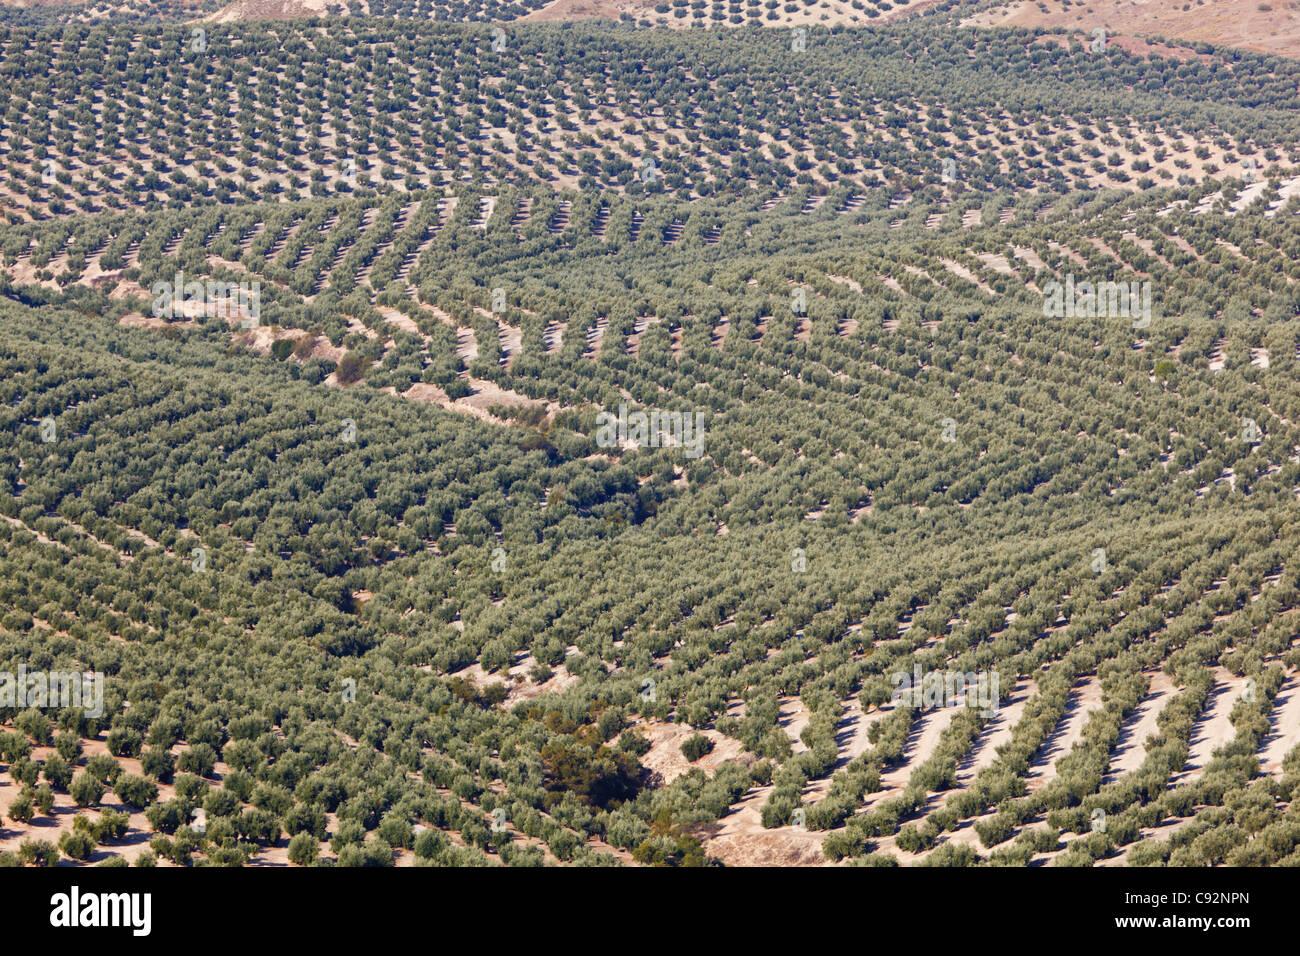 Olive groves near Mancha Real, Jaen Province, Spain. Stock Photo